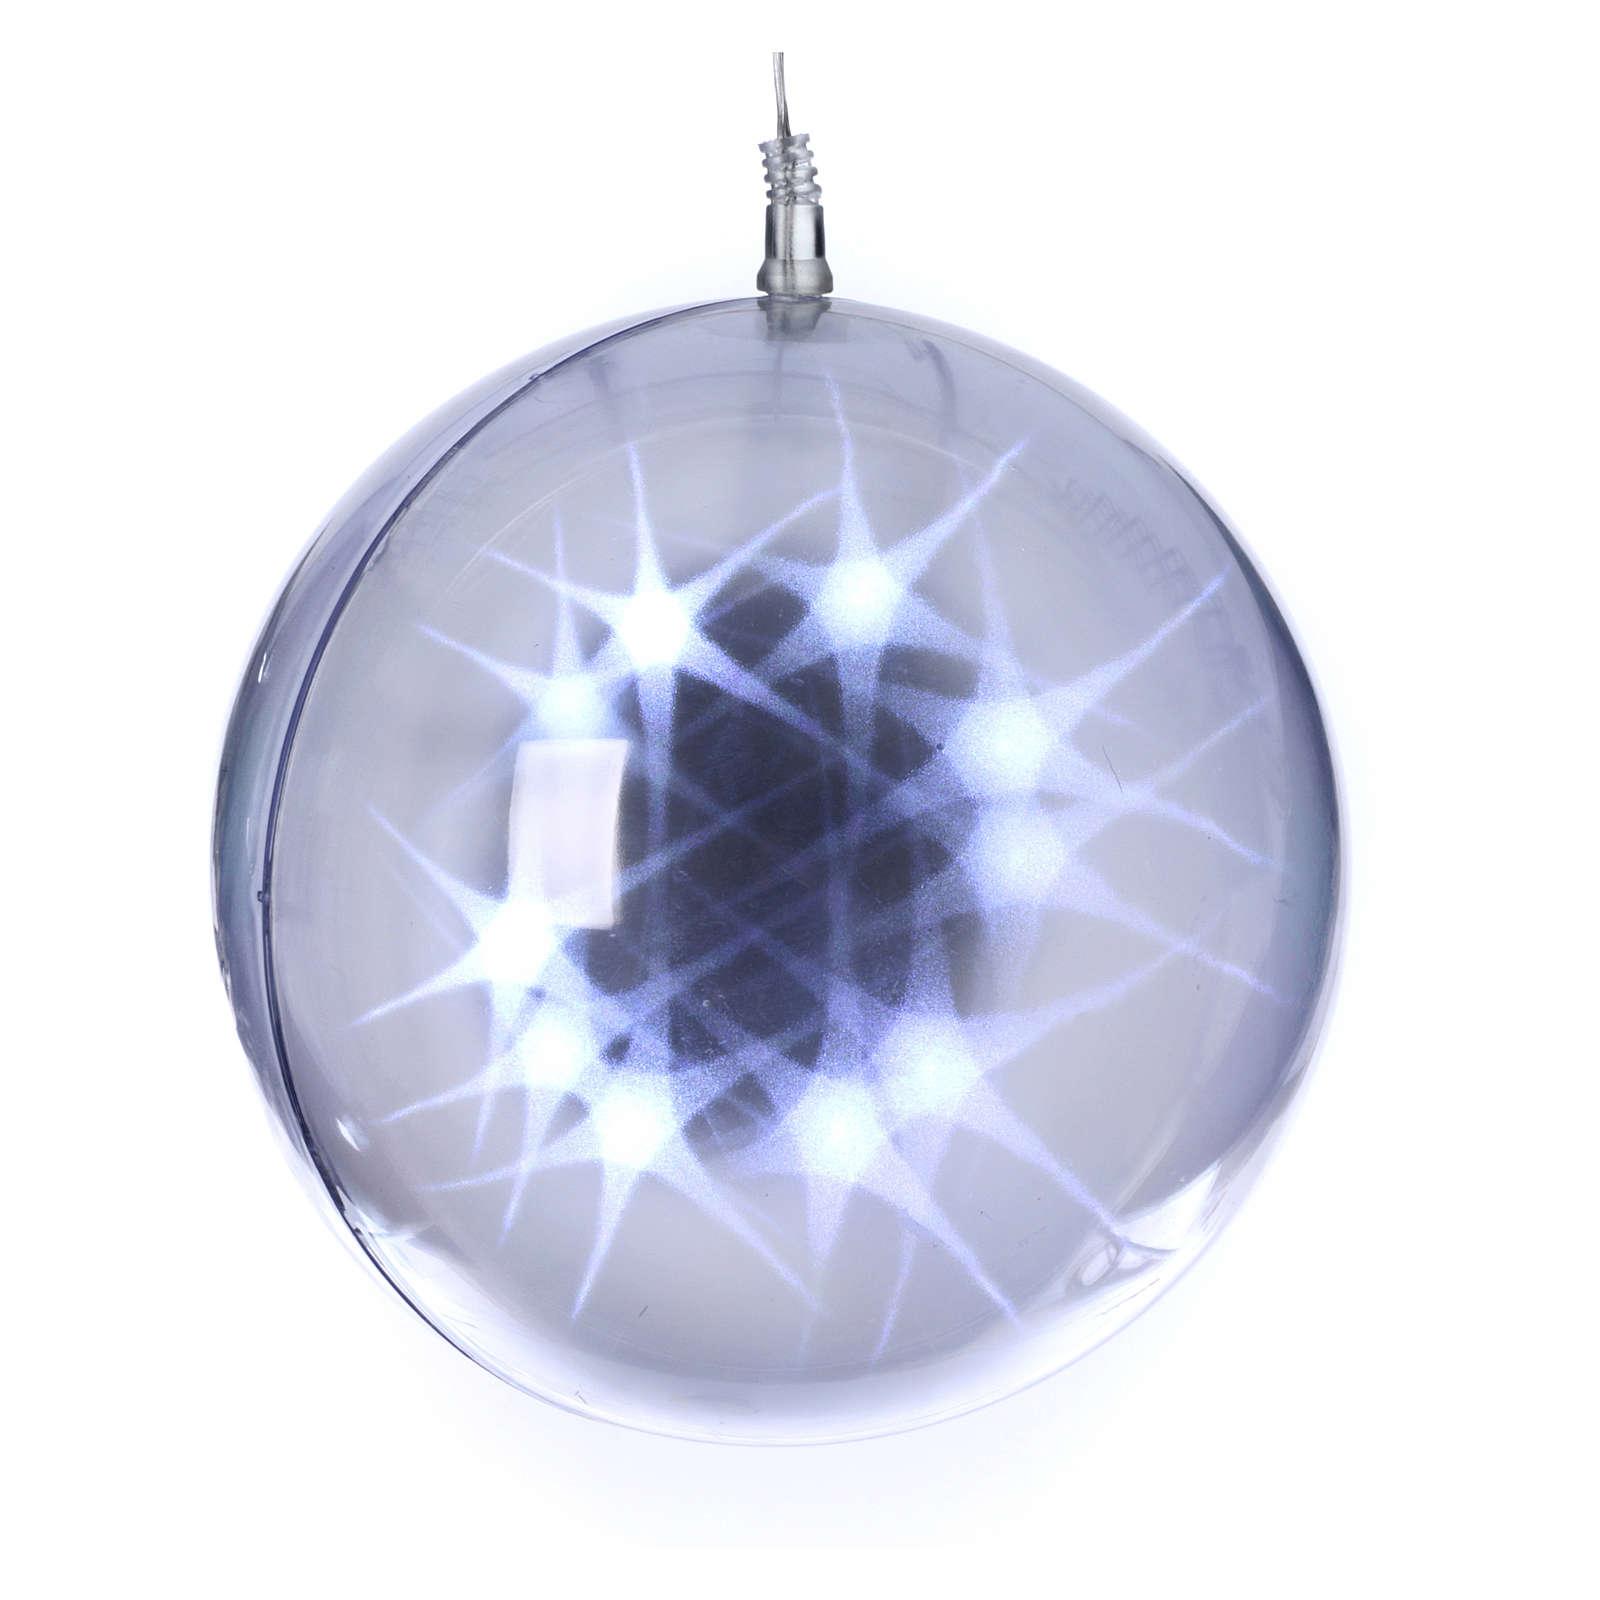 Illuminated sphere with light games 48 leds diam. 20 cm internal use 3